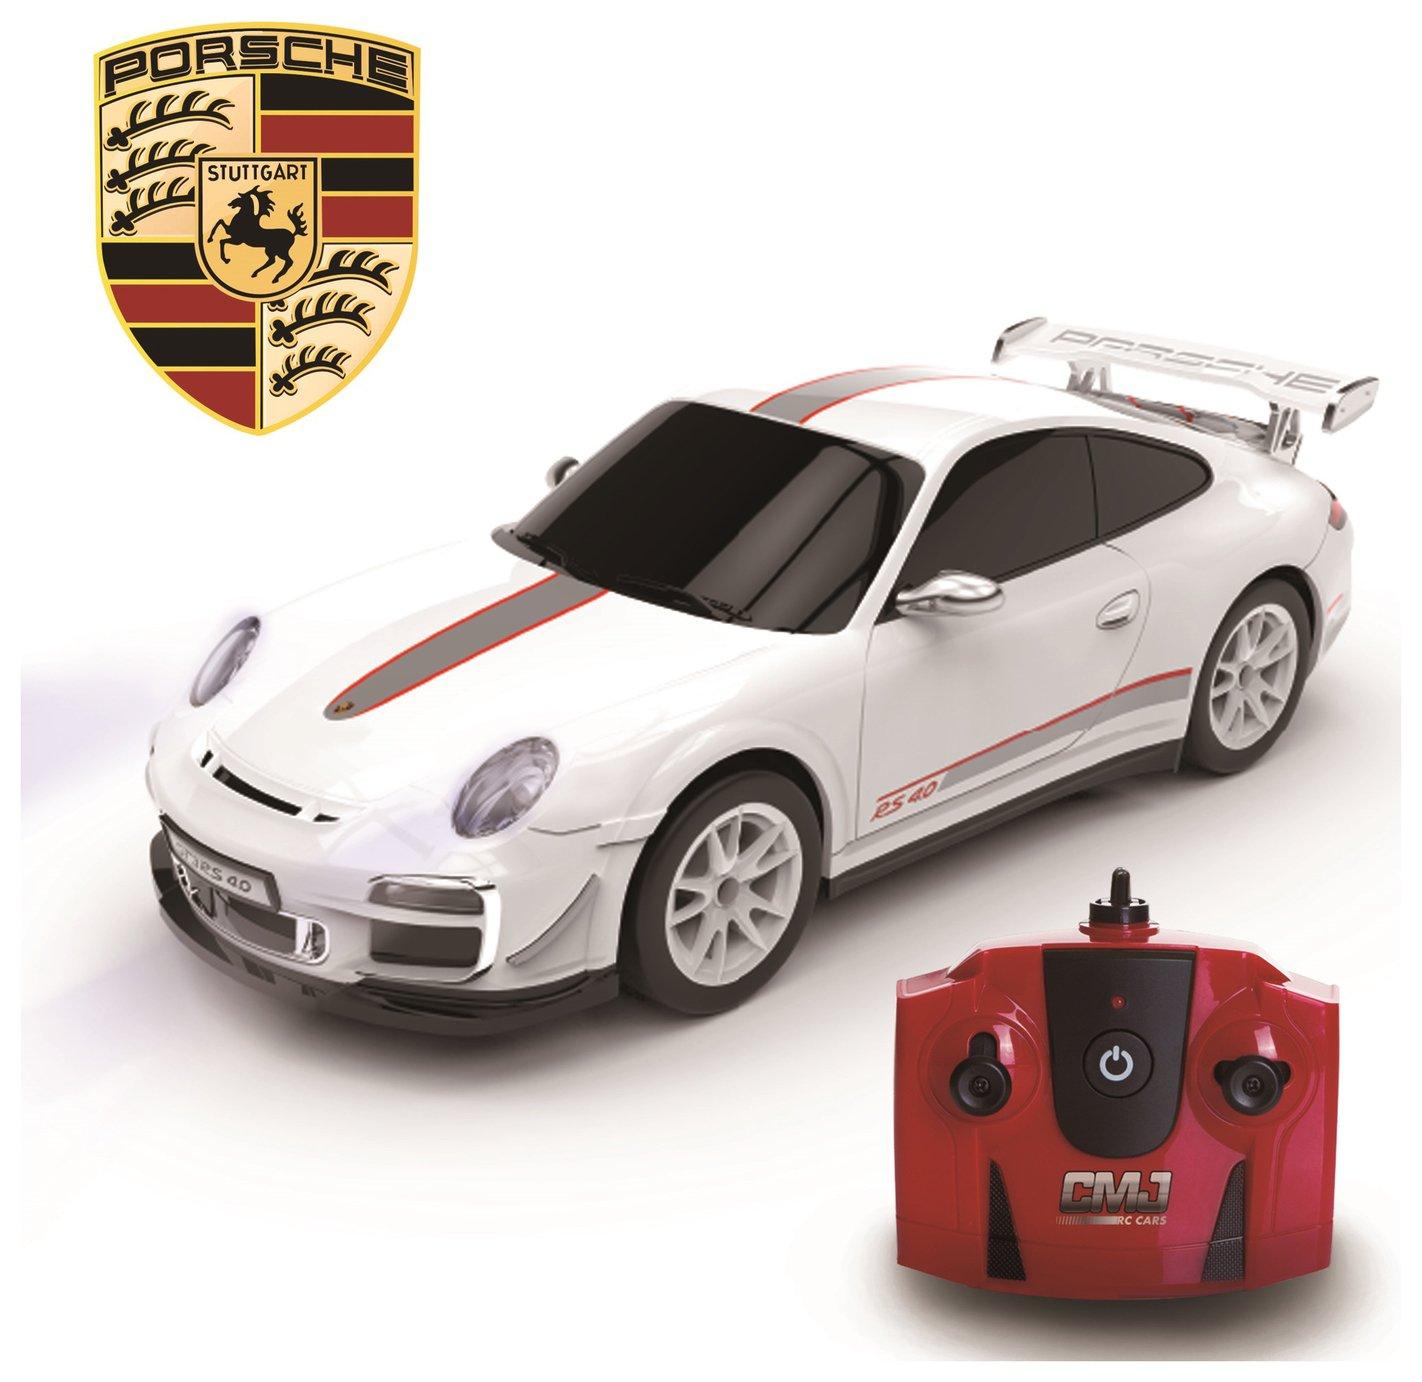 Porsche 911 1:24 Remote Control Car - Orange.